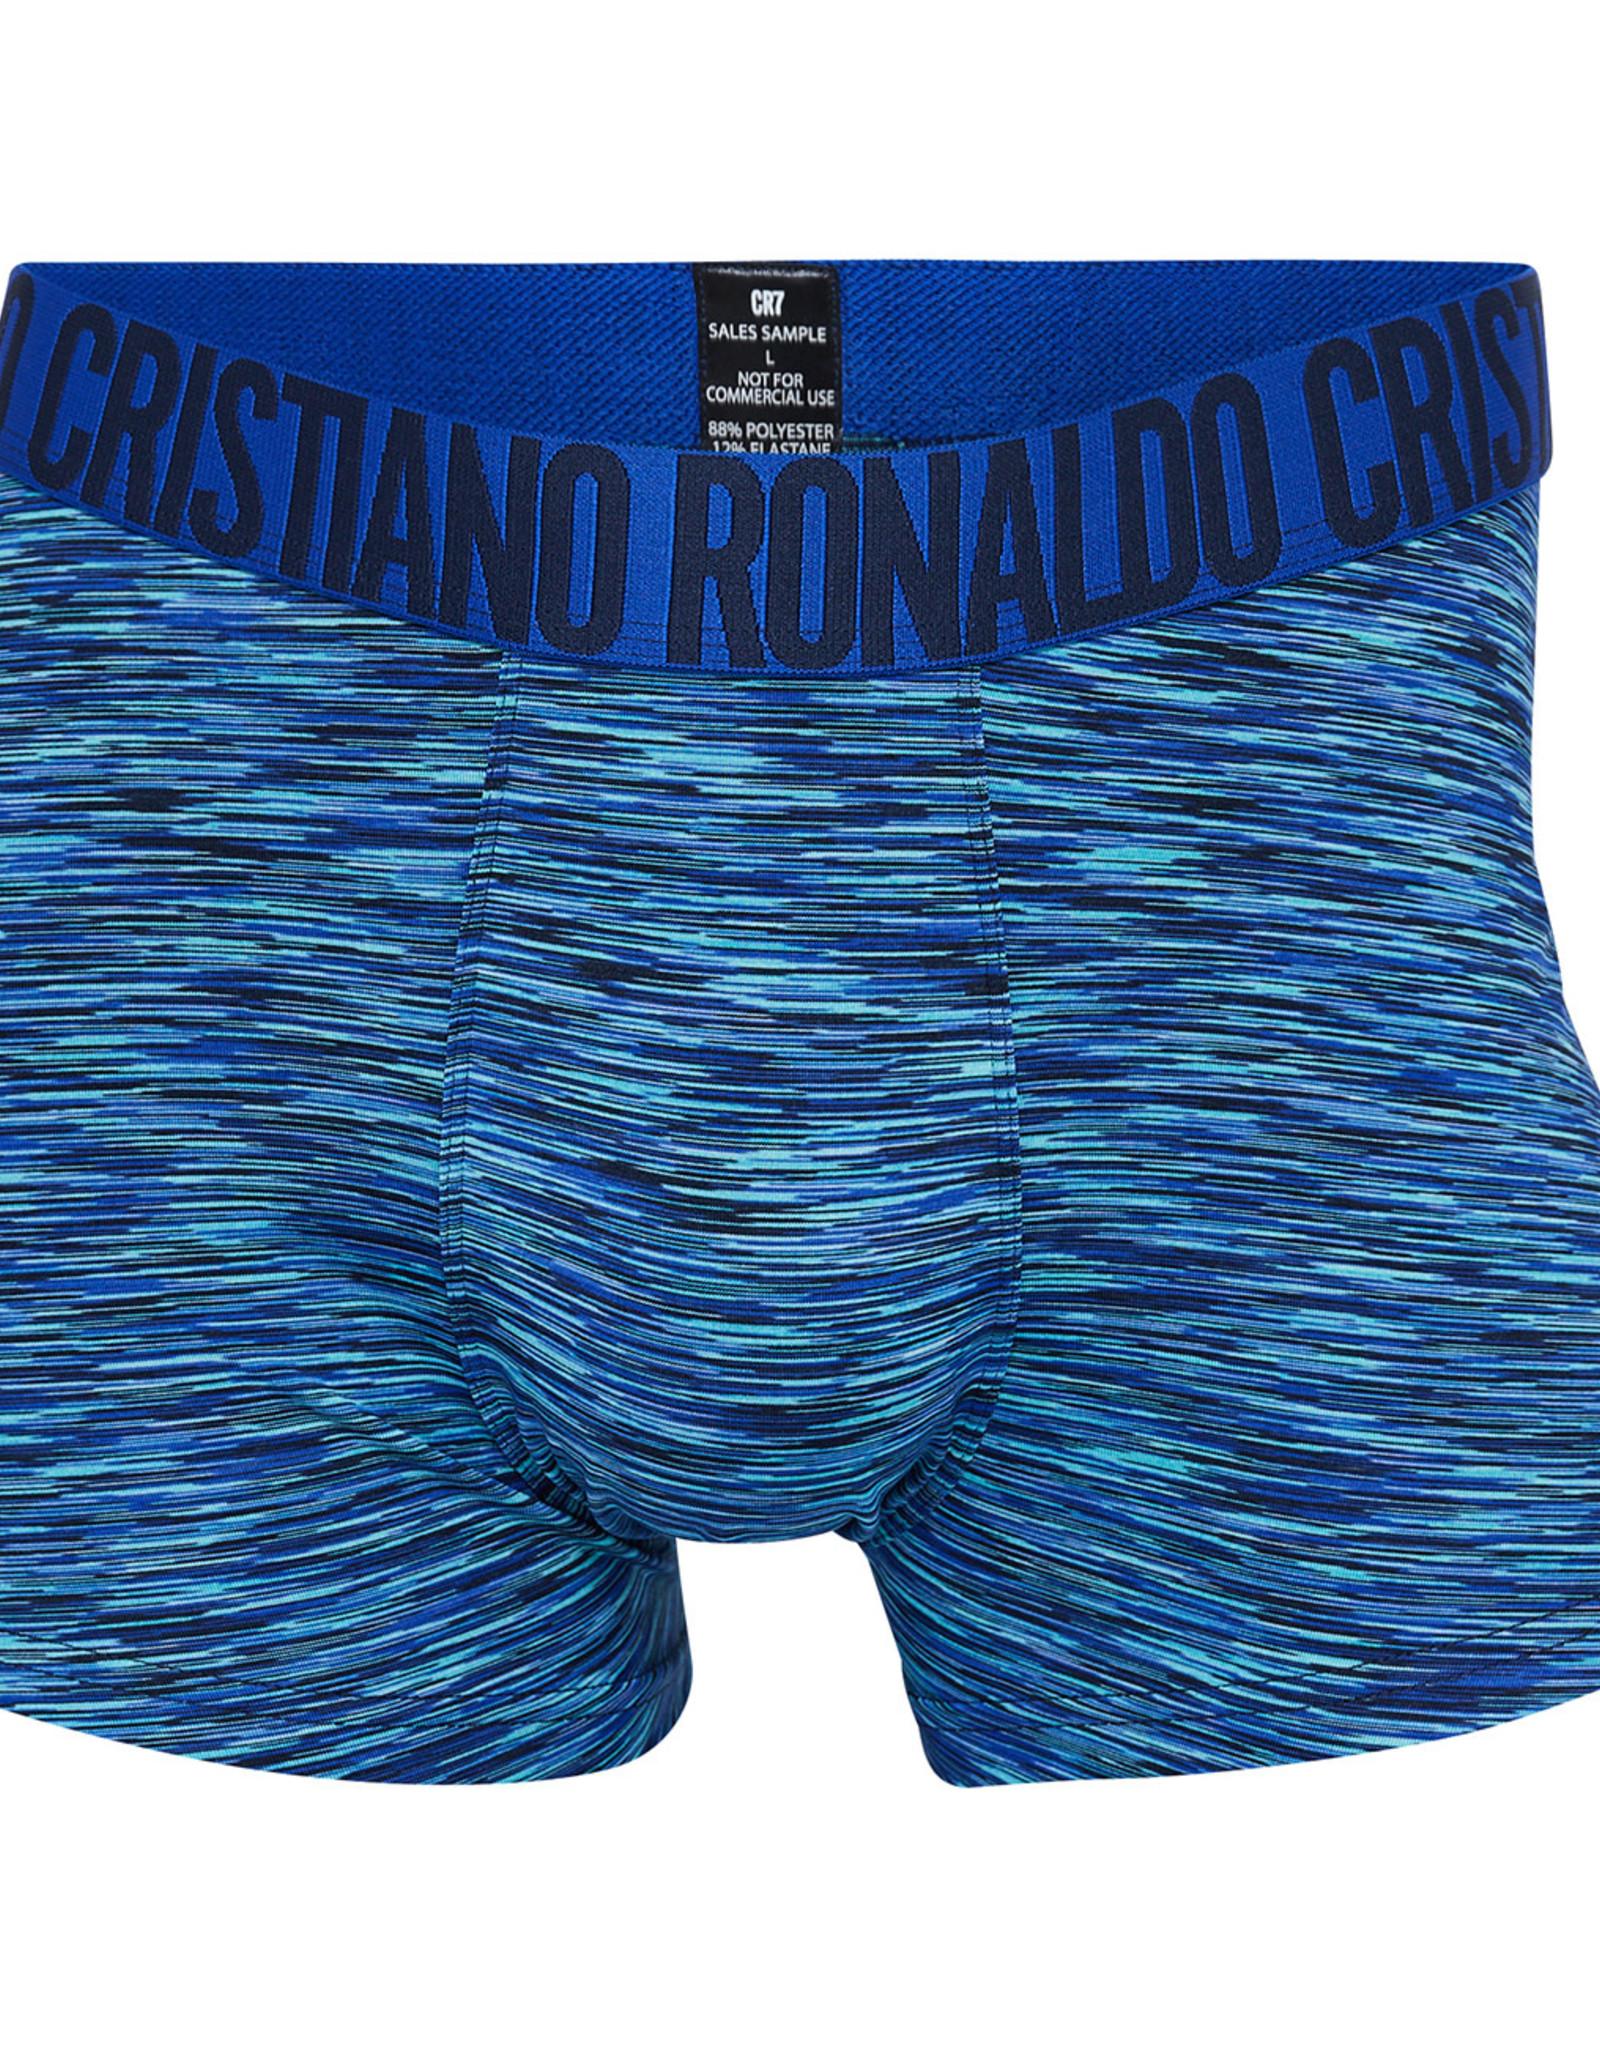 Cristiano Ronaldo Trunk Microfiber 2-pack